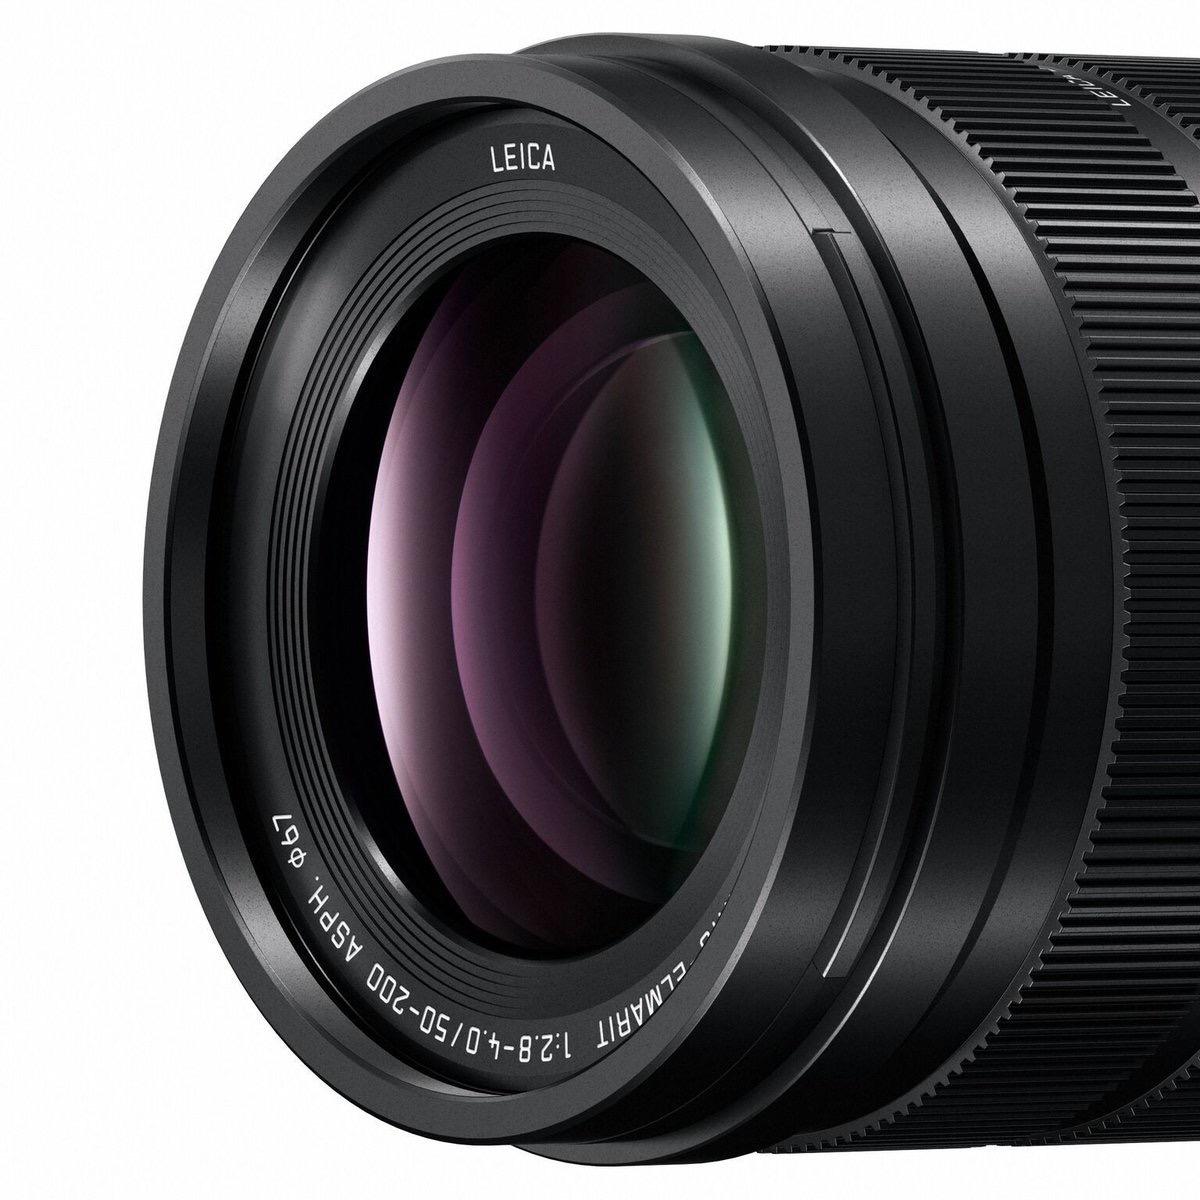 Передний элемент Leica DG Vario-Elmarit 50-200mm f/2.8-4.0 Asph. Power OIS